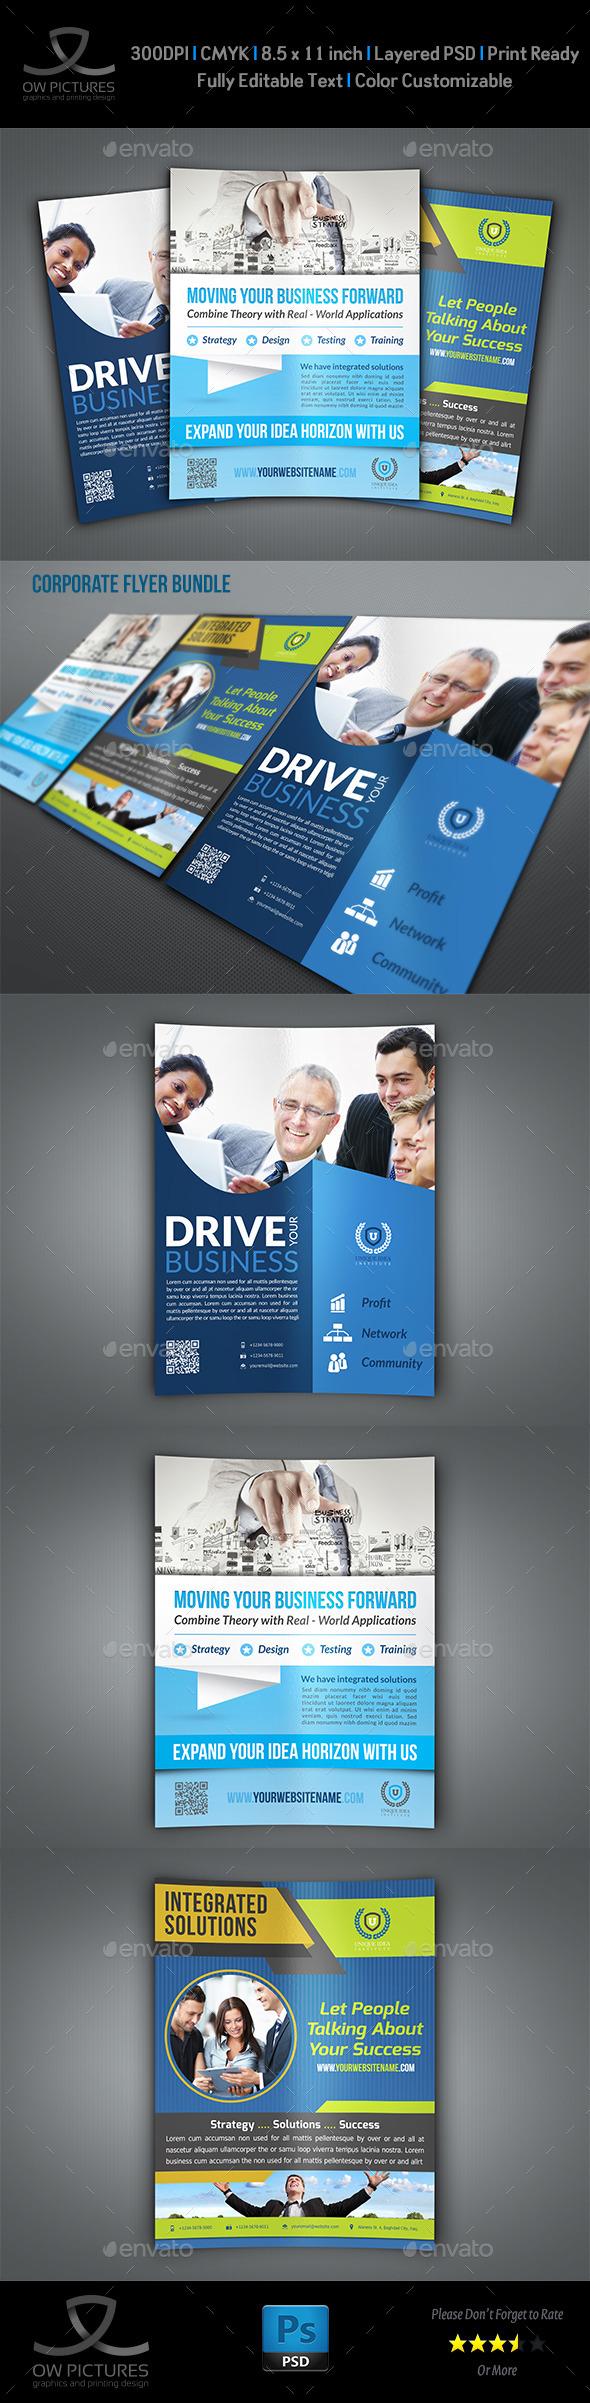 Corporate Flyer Bundle Template Vo.4 - Flyers Print Templates